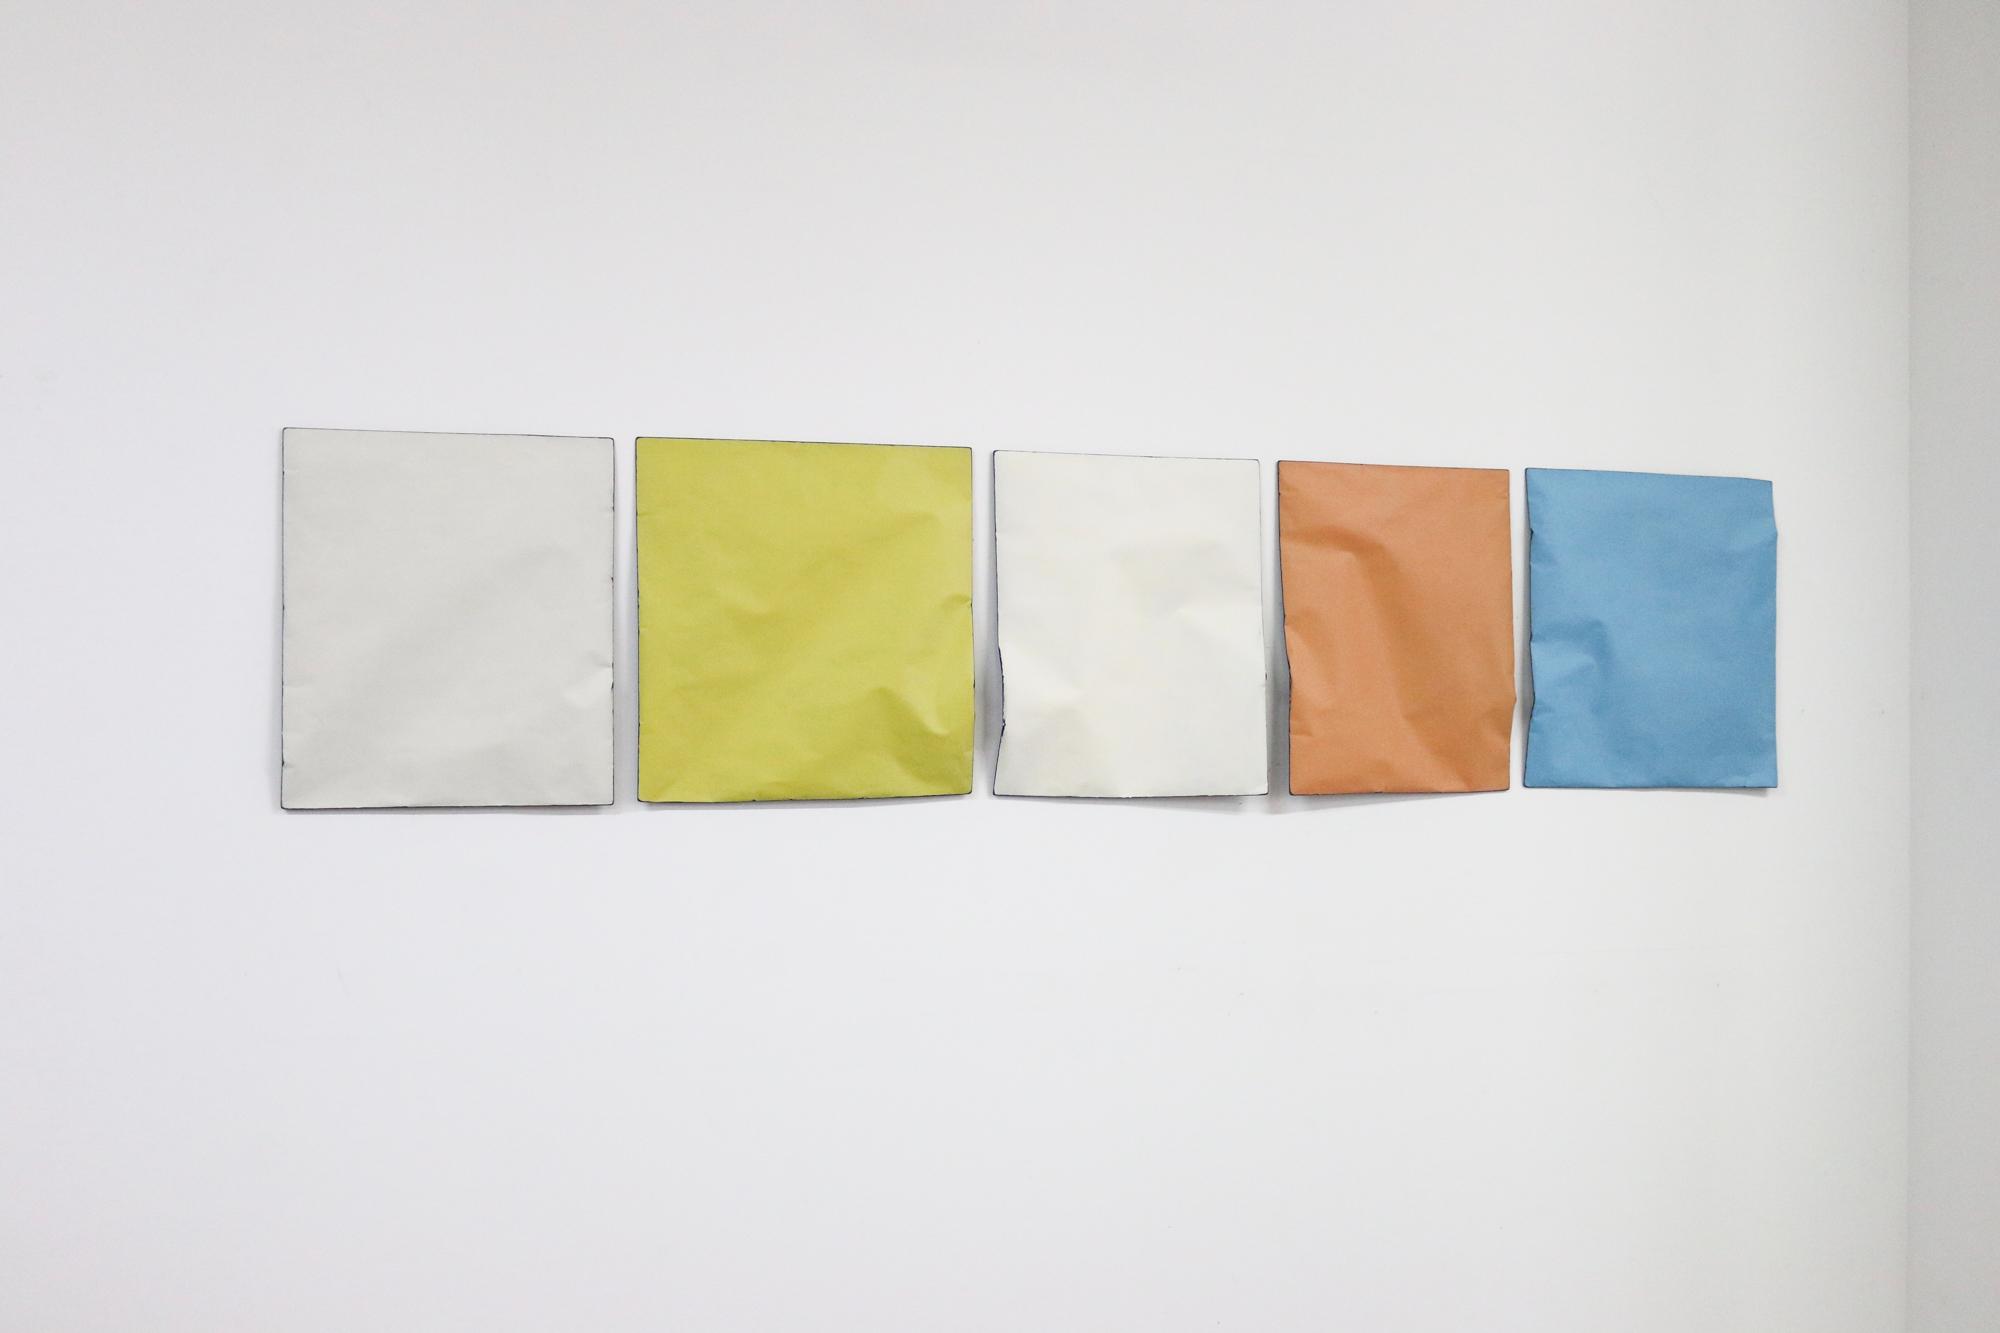 Johan De Wit, Untitled, 2018, Paper, Resin, Marble, Acrylic, 216 x 46.5 cm, Affinity Art